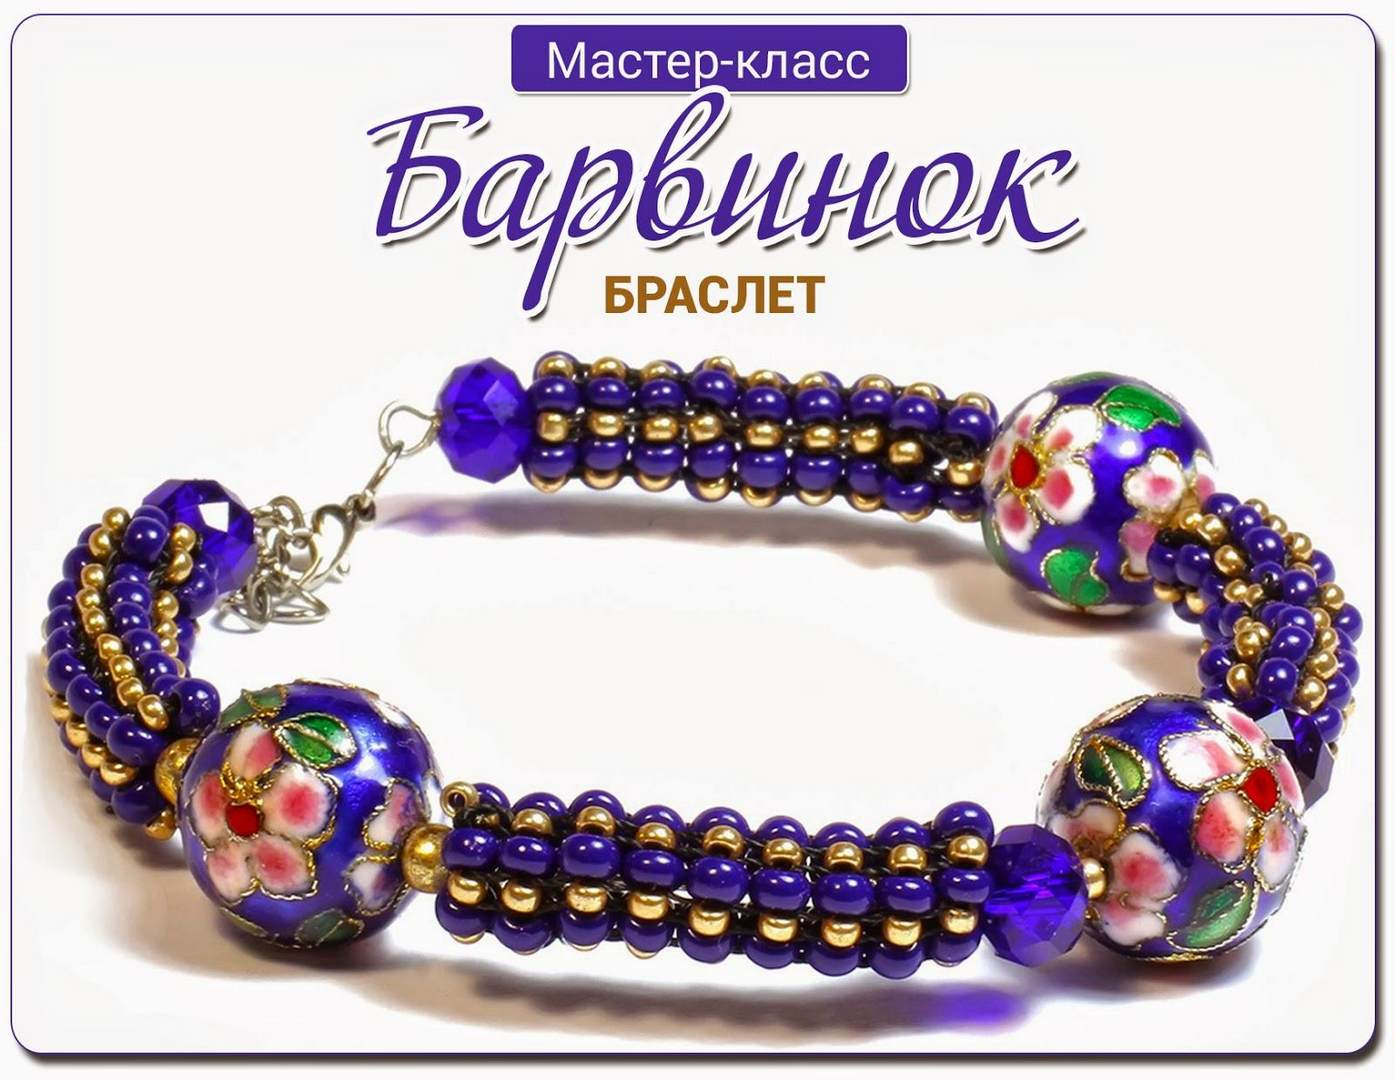 Мастер-класс «Барвинок»  Жгут бисер и бусины в необычном плетении